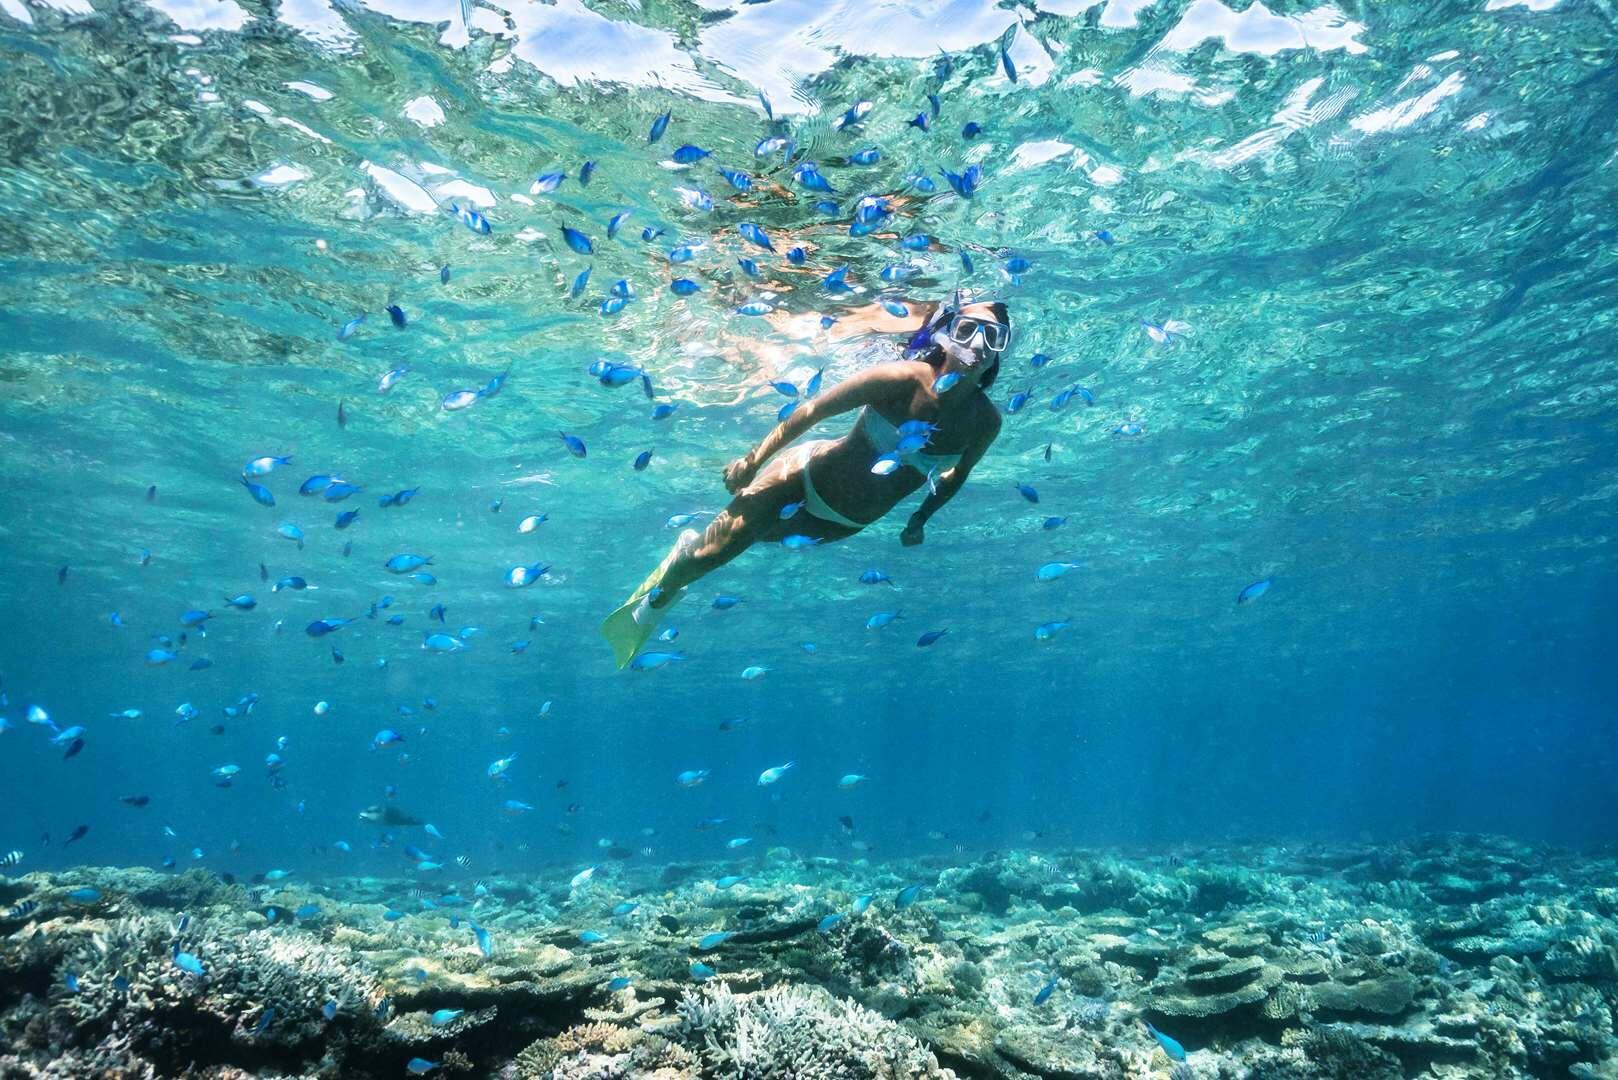 Snorkelling Activity at Heron Reef